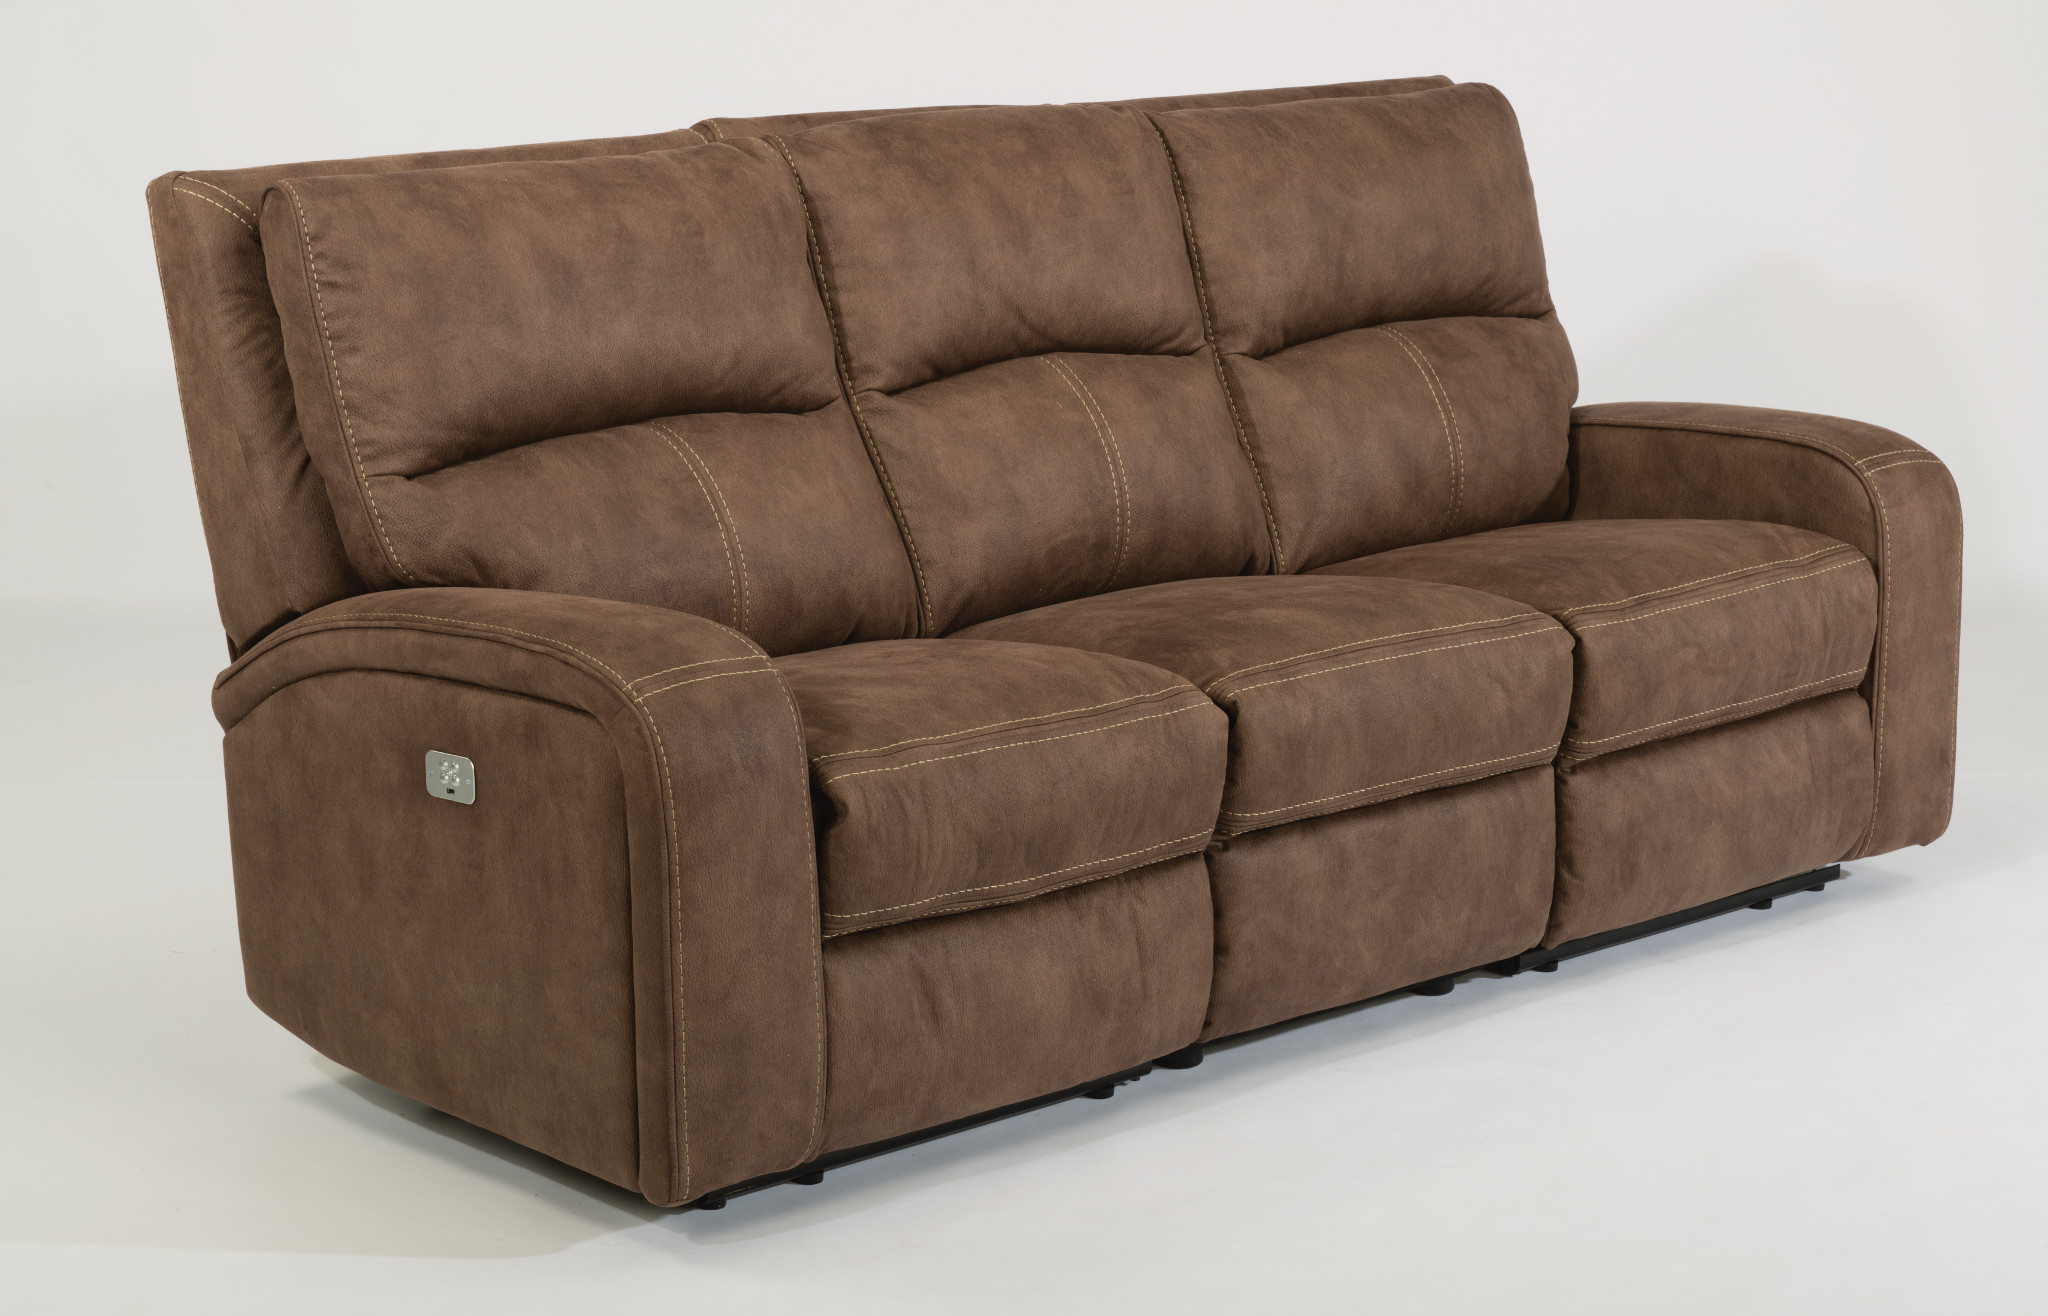 Flexsteel Rhapsody Power Sofa Johnson Furniture Mattress